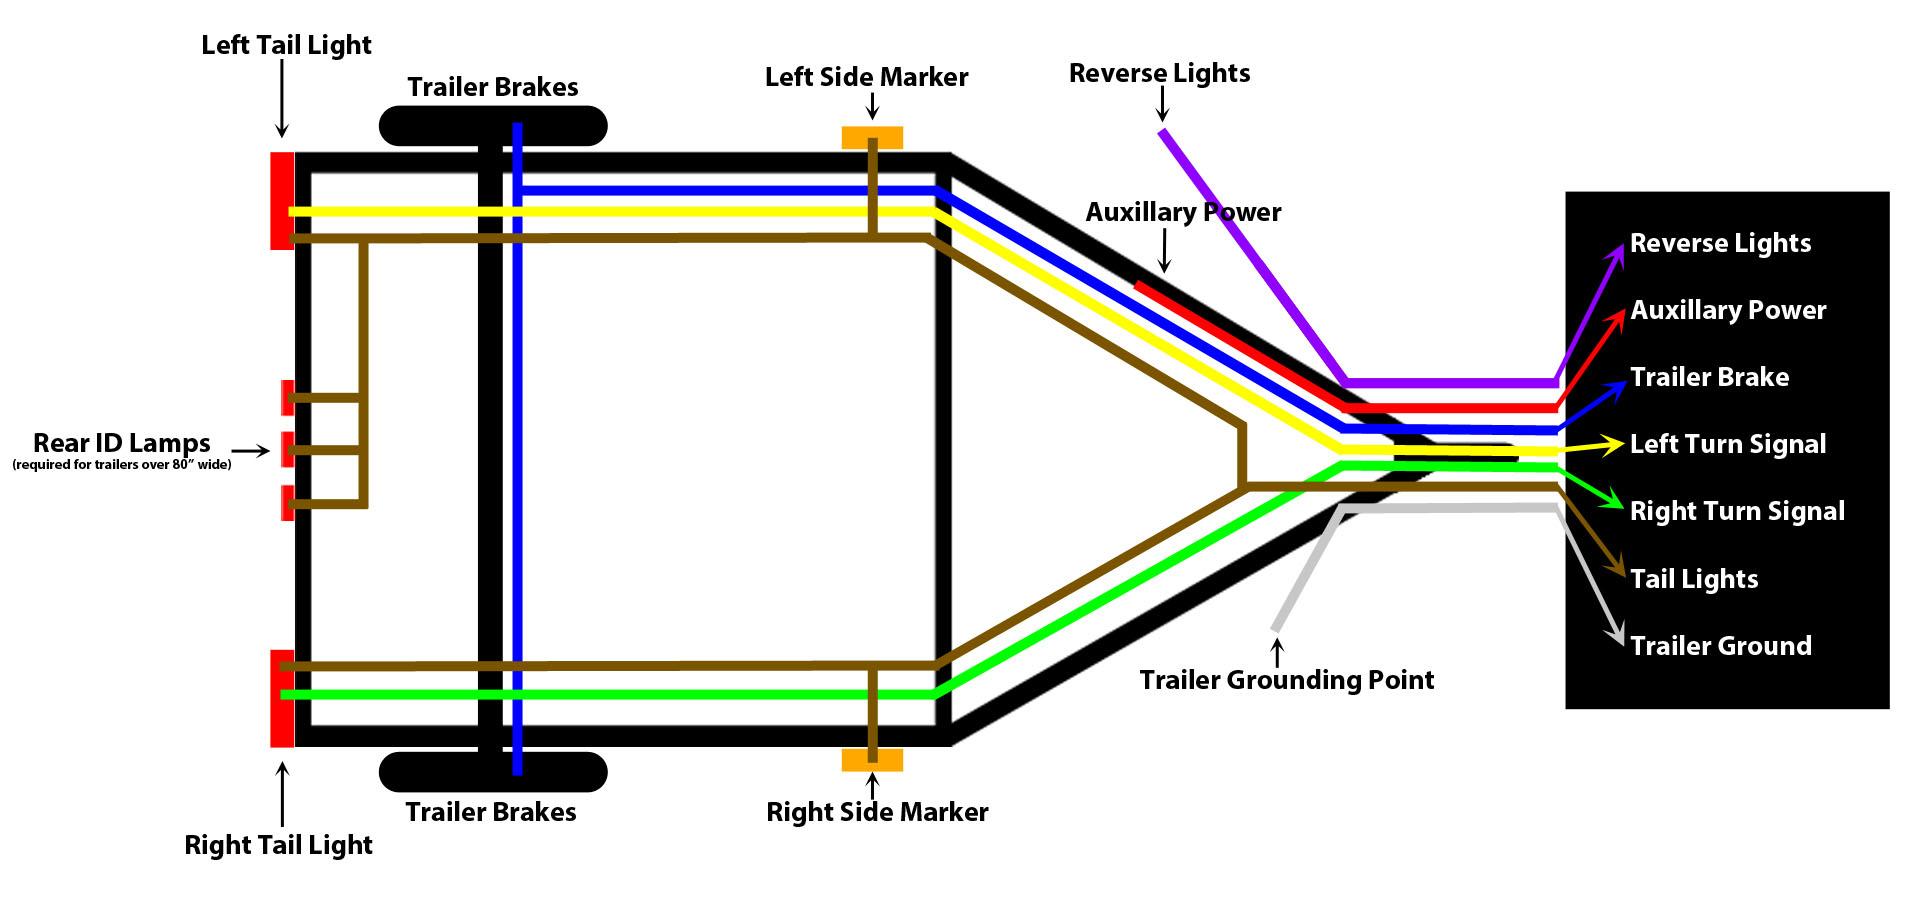 7 pin trailer harness manual e books 4 pin wiring diagram Boat Trailer Wiring Diagram 7 pin trailer harness manual e books \u2013 4 pin wiring diagram